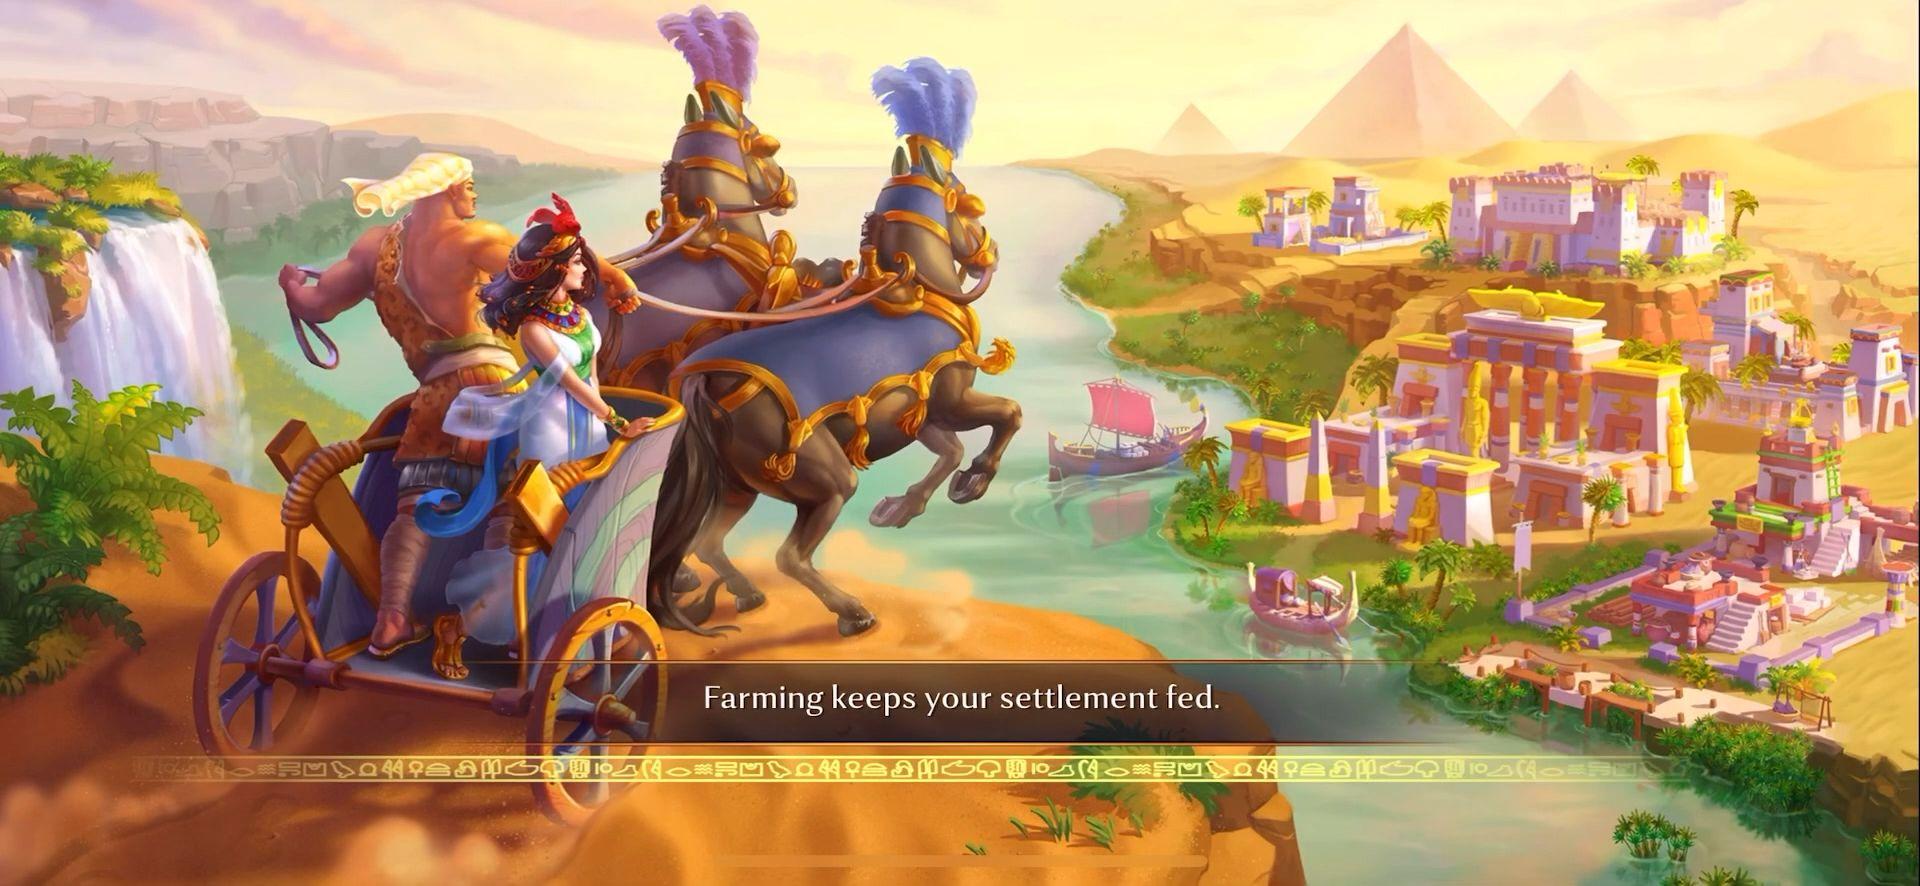 Jewels of Egypt: Match Game скріншот 1